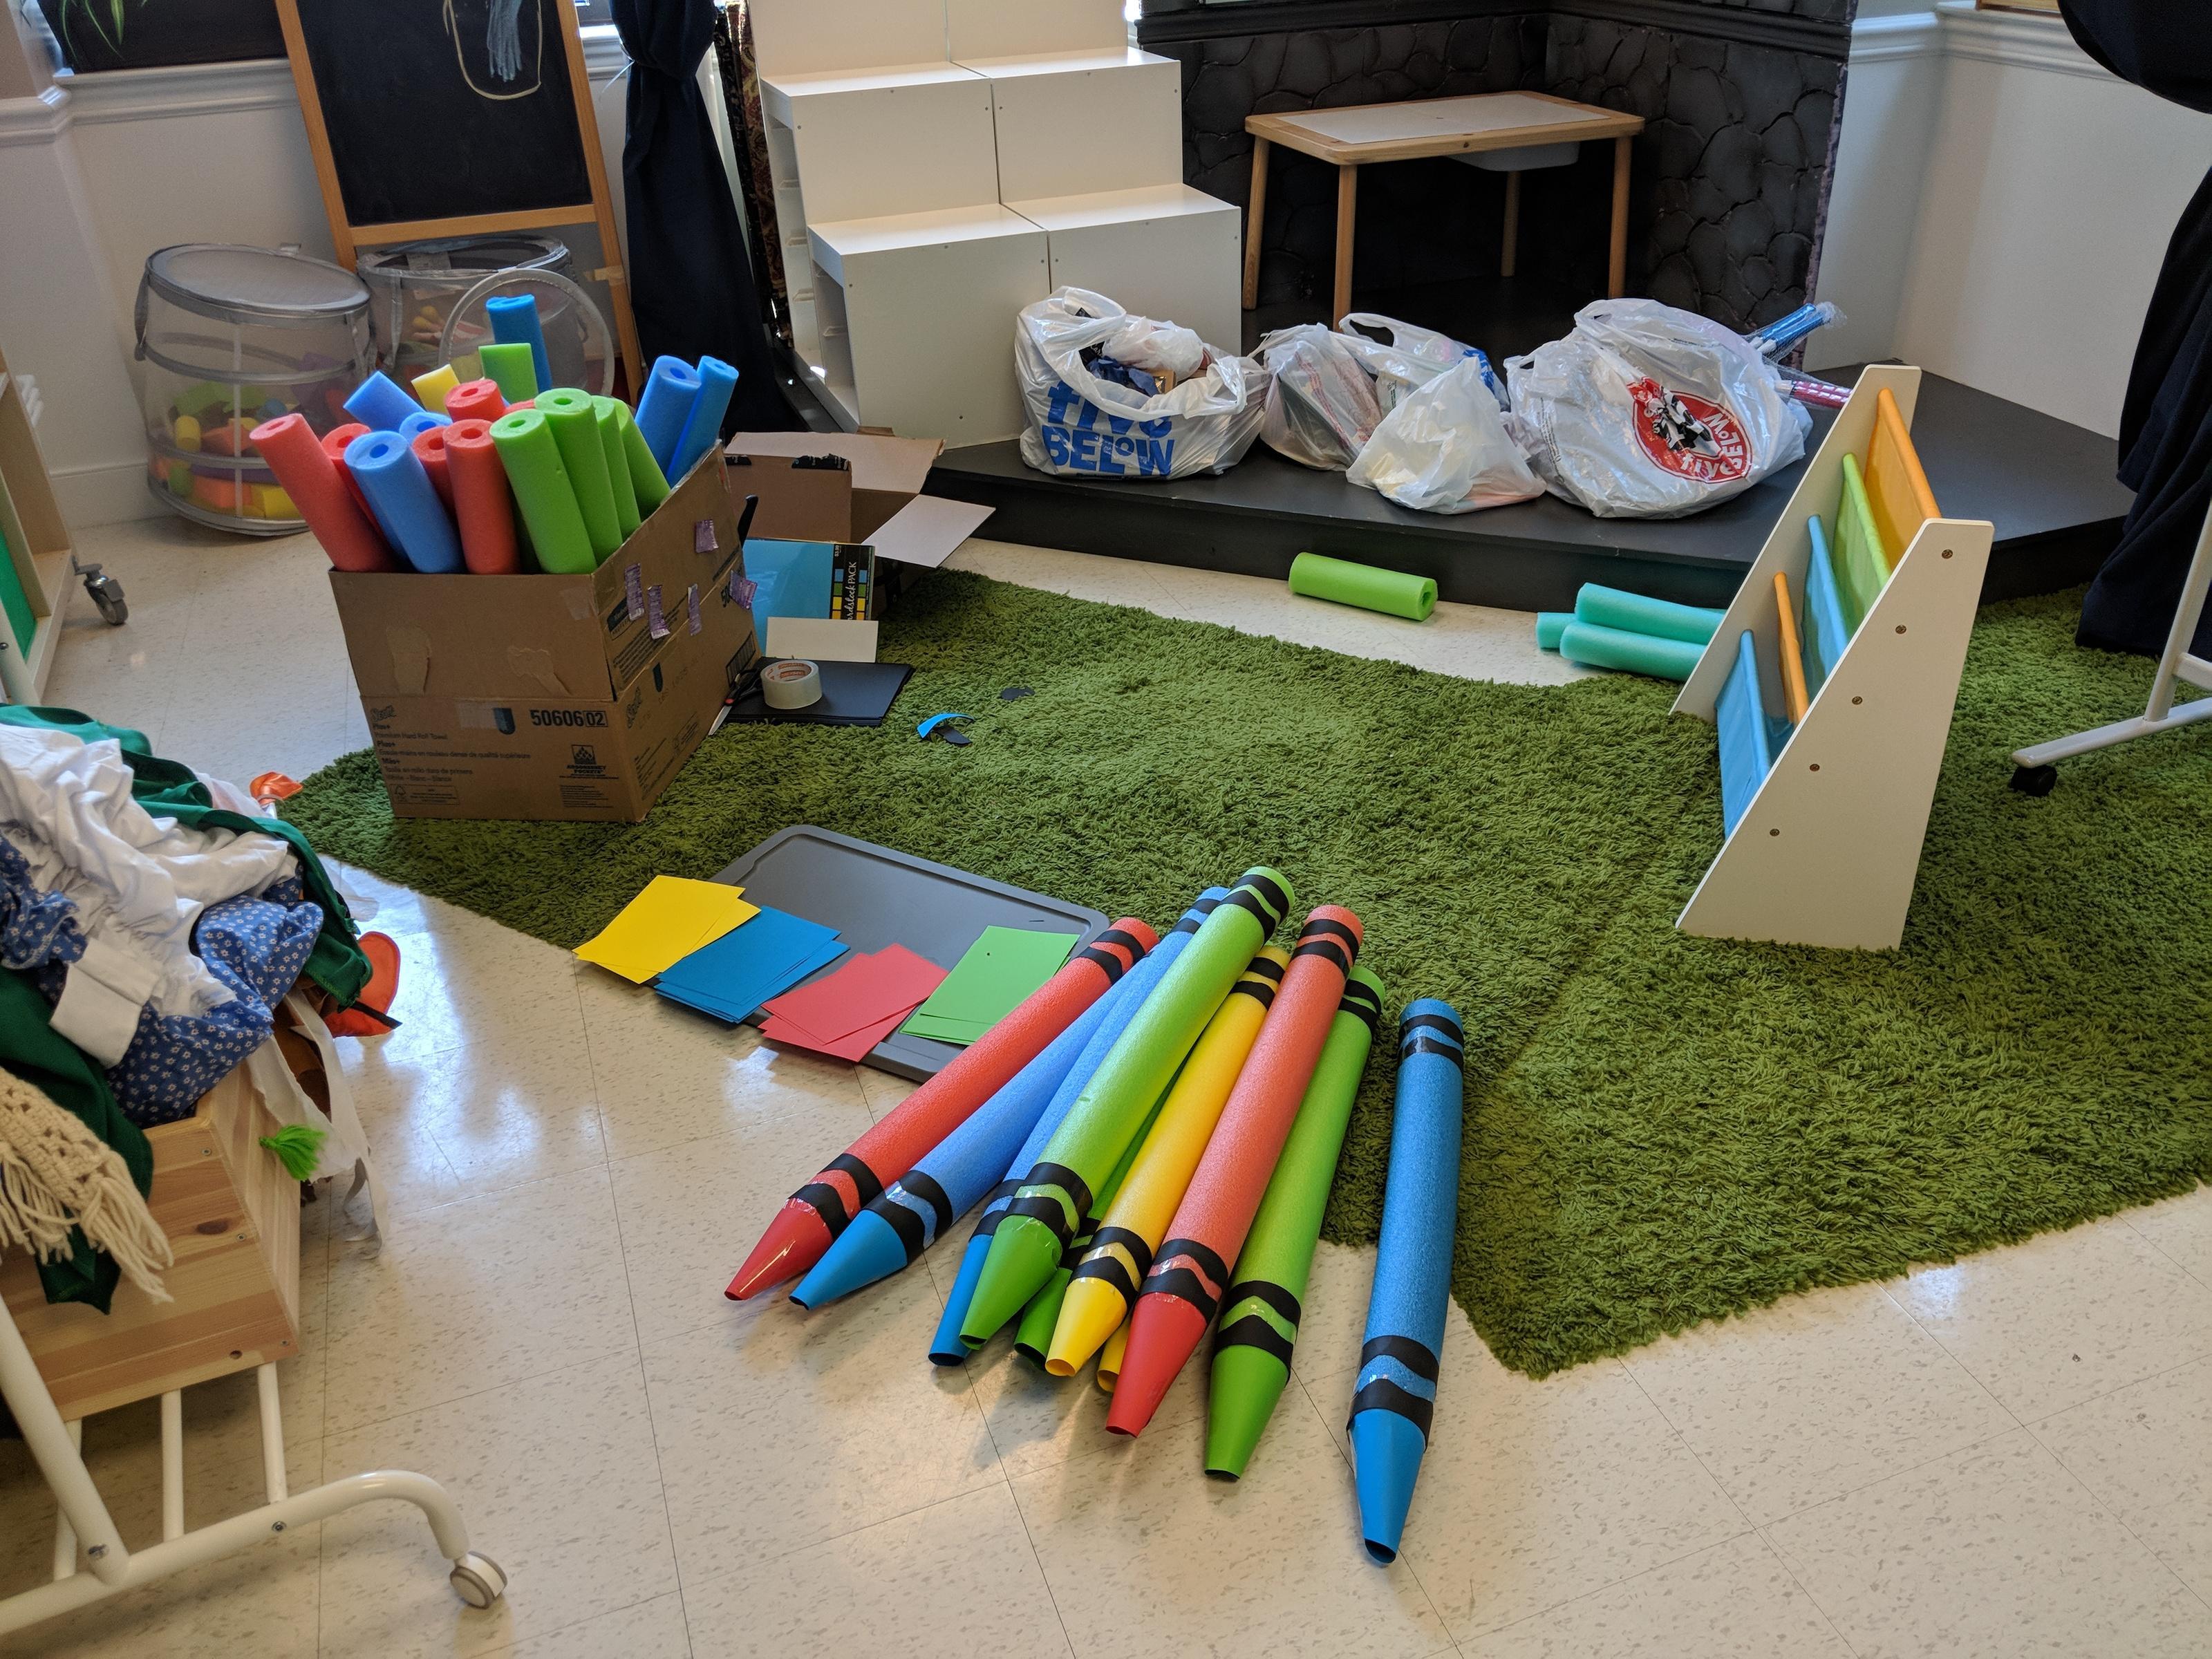 Center Stage Preschool image 46